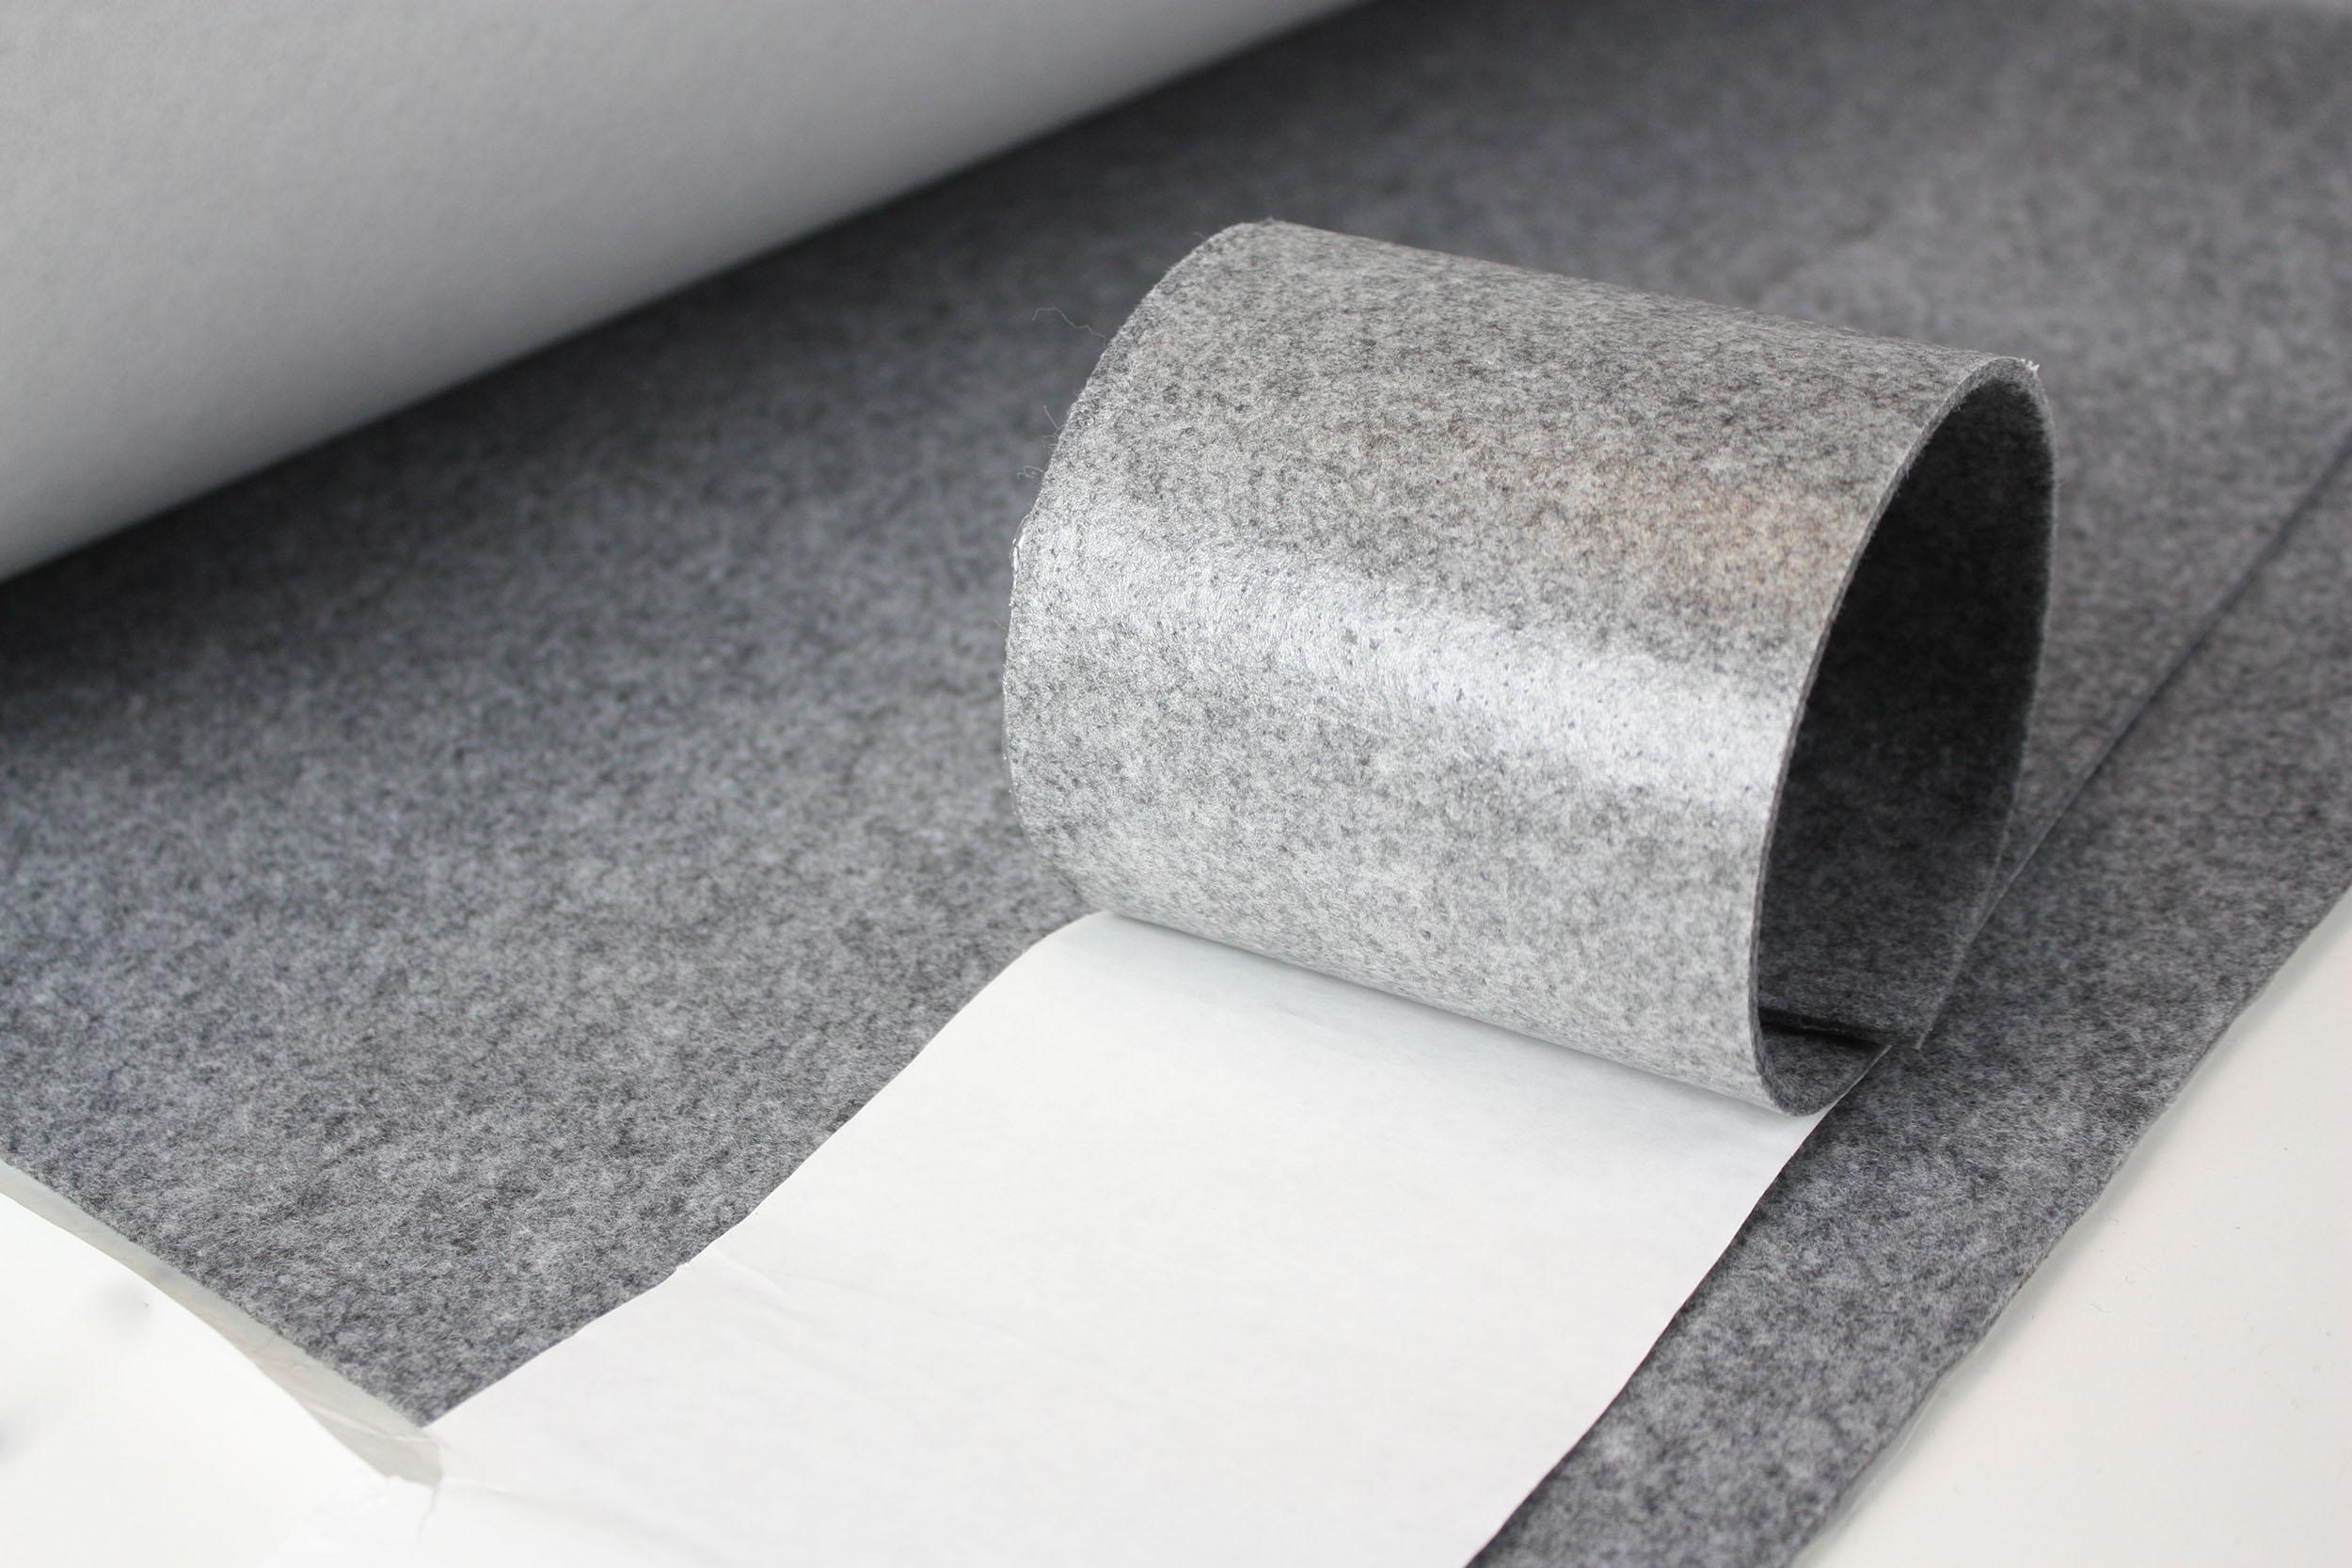 filz m belgleiter meterware 4 5mm dick selbstklebend grau neu ebay. Black Bedroom Furniture Sets. Home Design Ideas